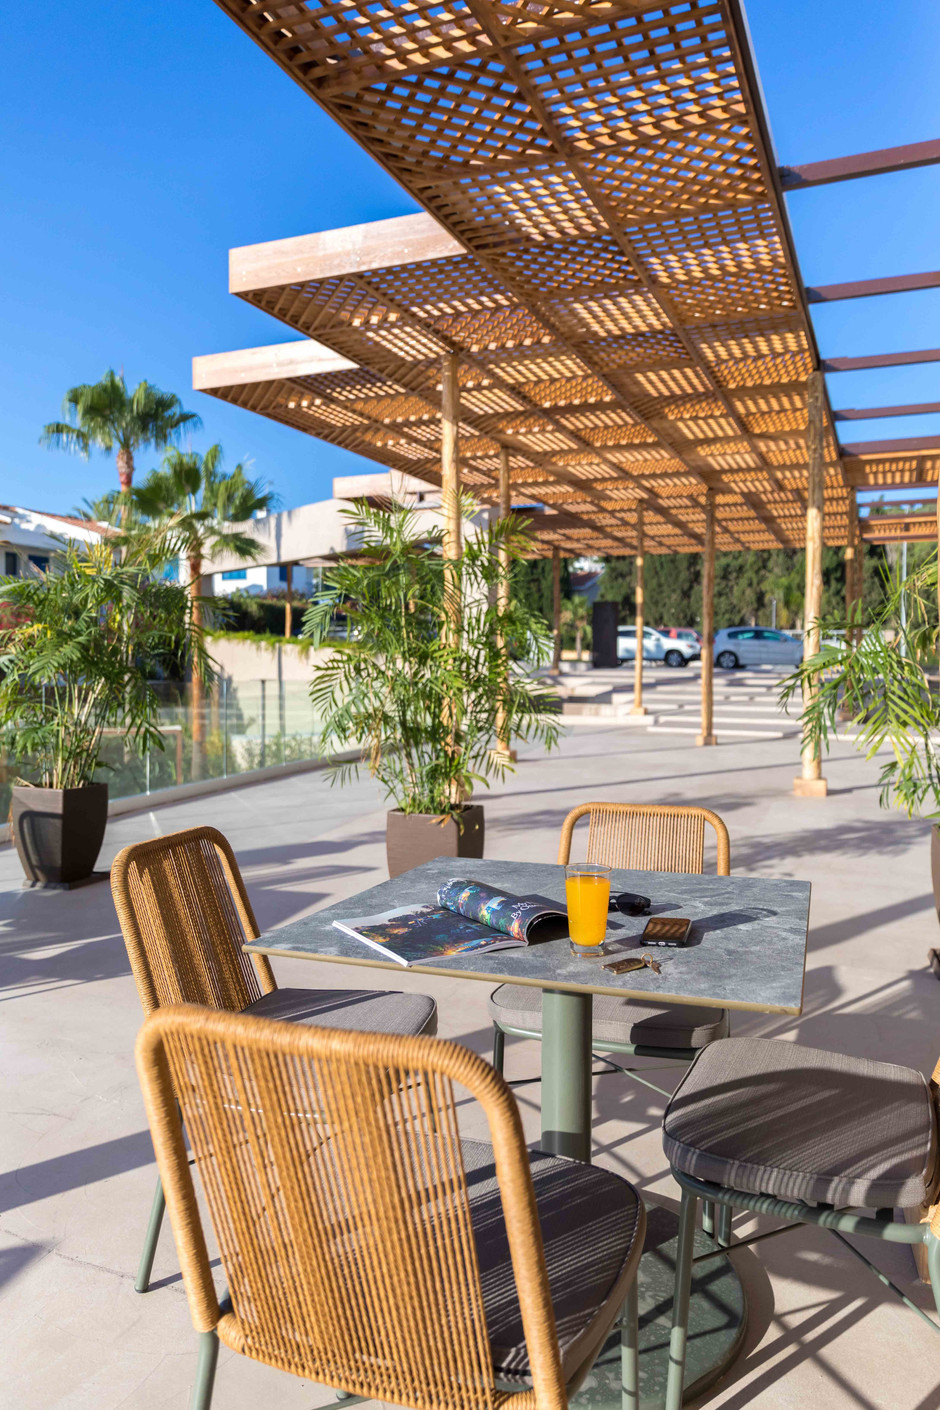 Cavo Zoe Seaside Hotel-52.jpg